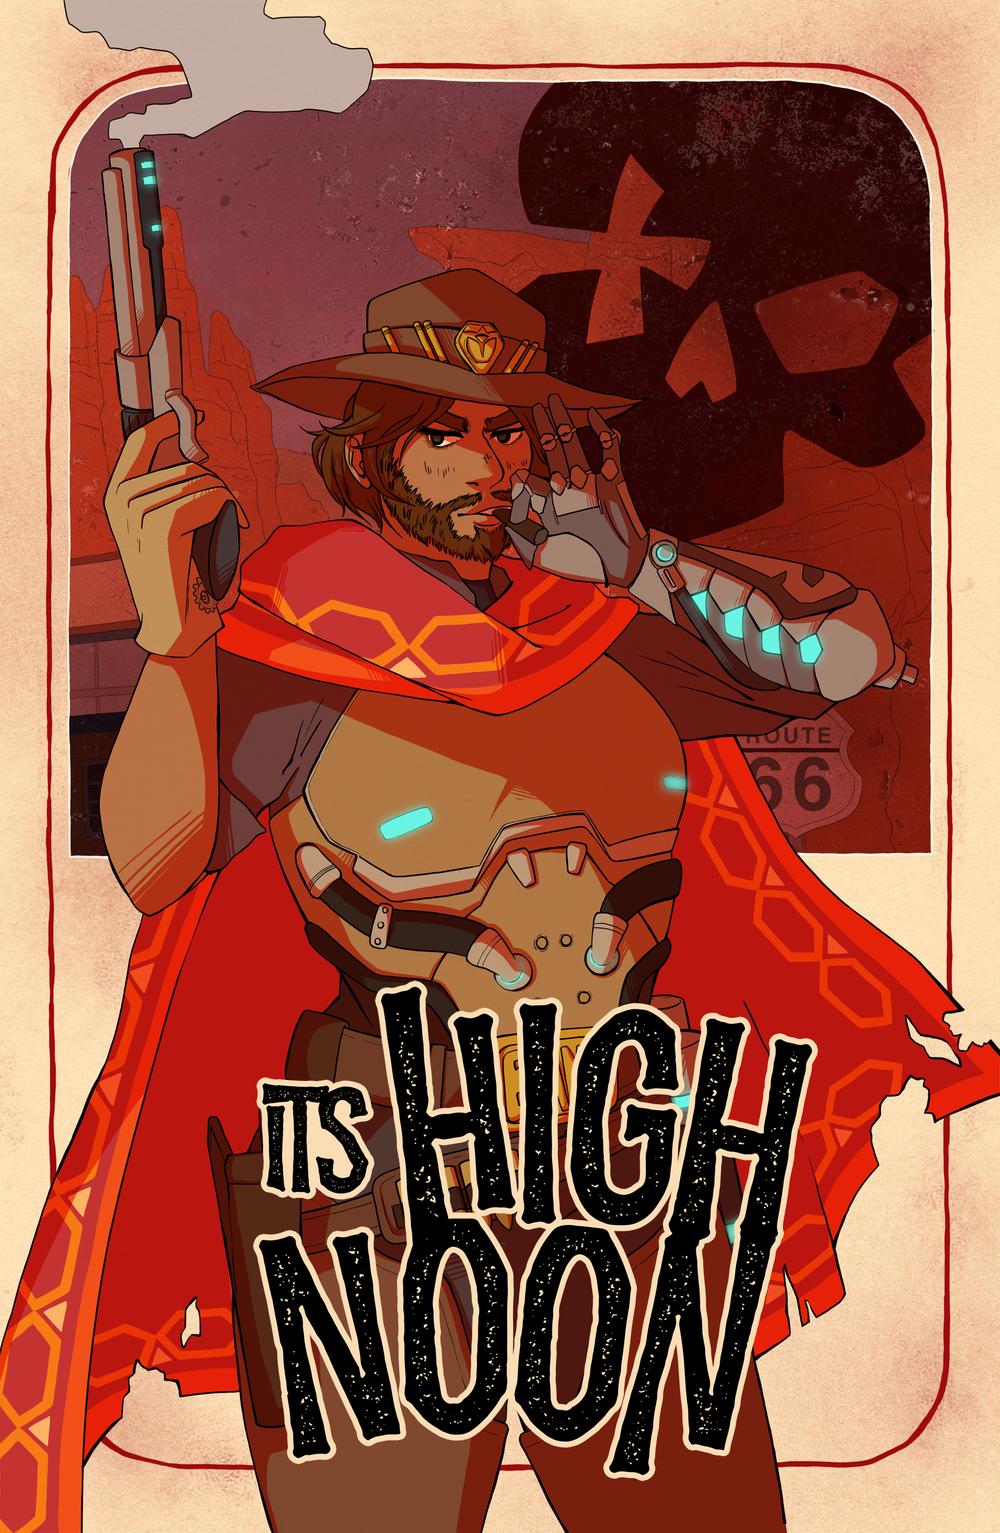 HIGH NOON (2016)